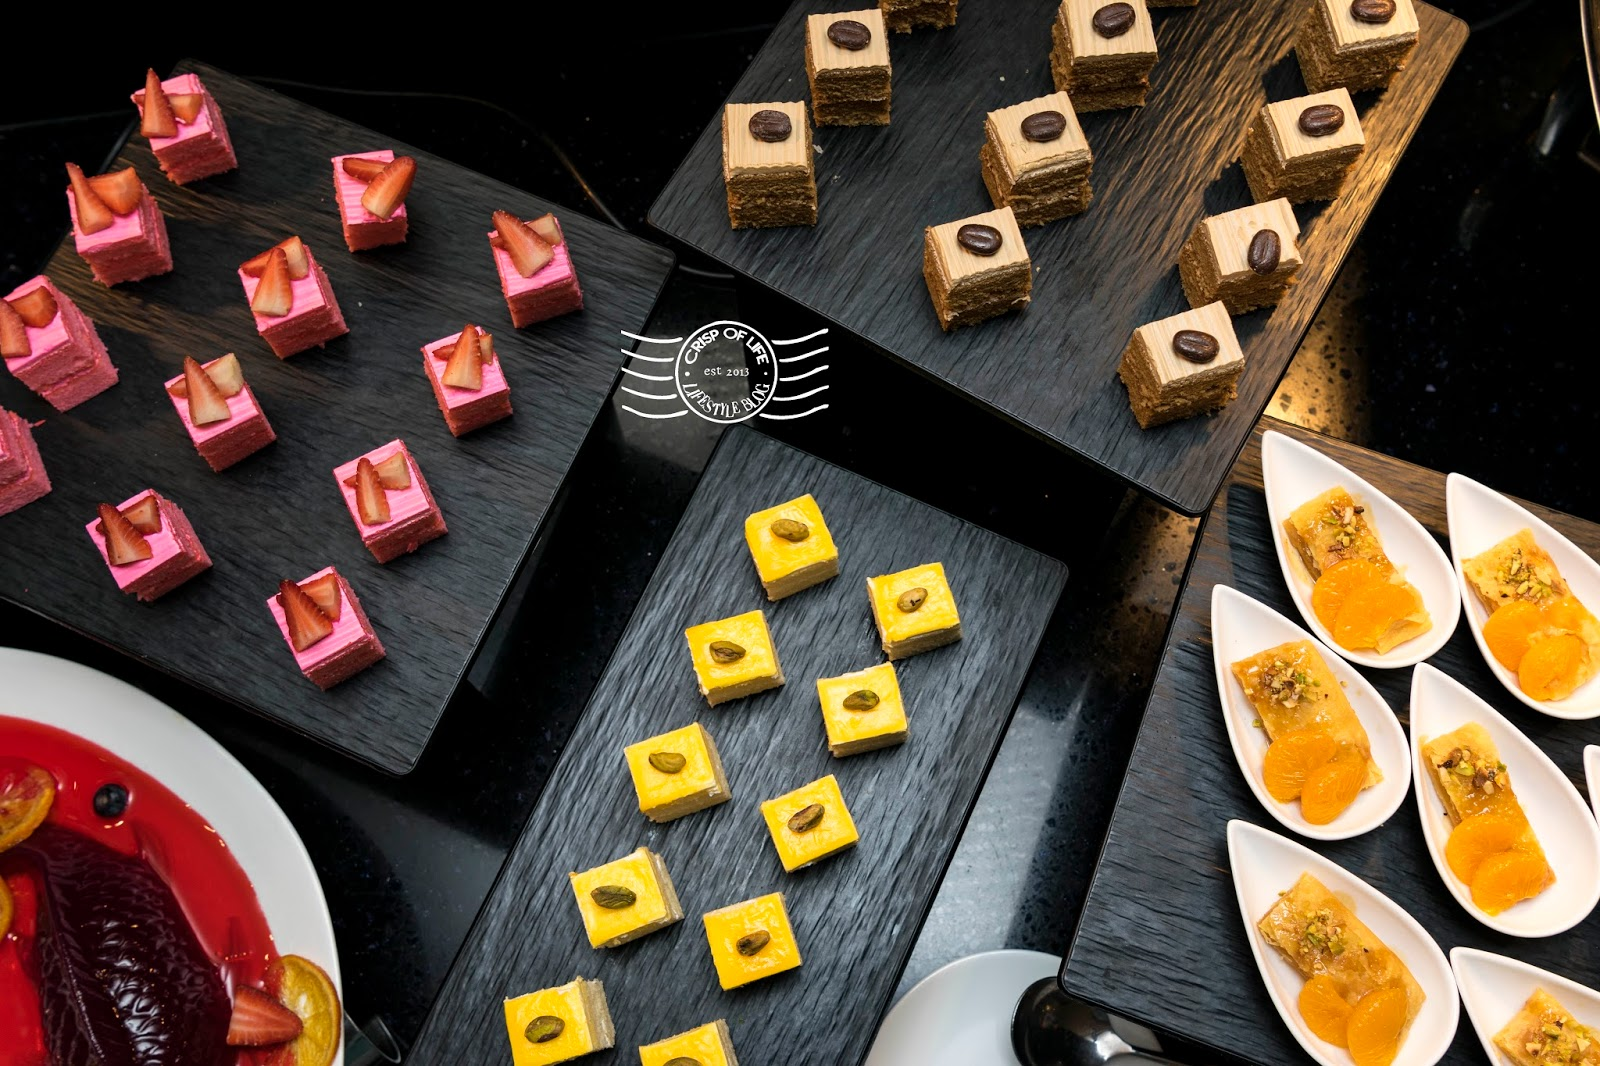 Iconic Hotel International Buffet Dinner